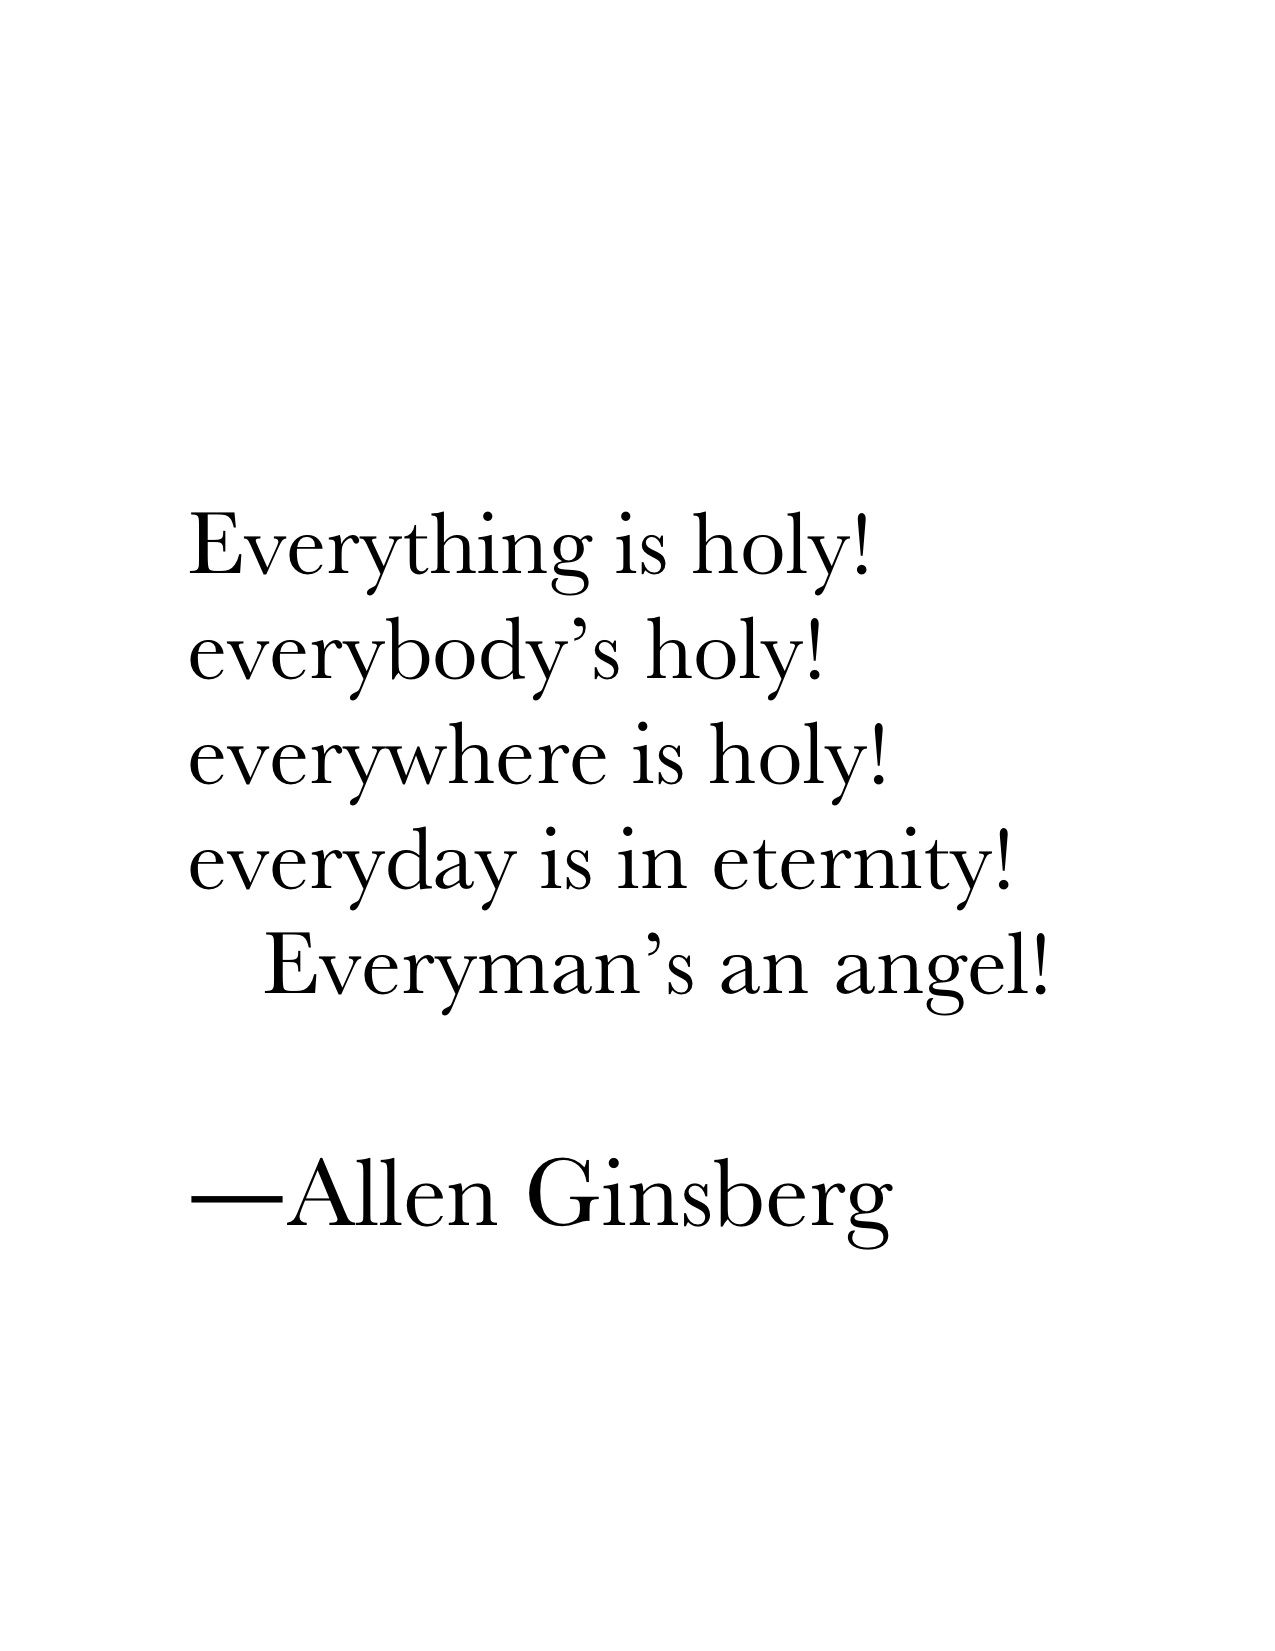 allen ginsberg idézetek Footnote to Howl by Allen Ginsberg : The Poetry Foundation | Allen